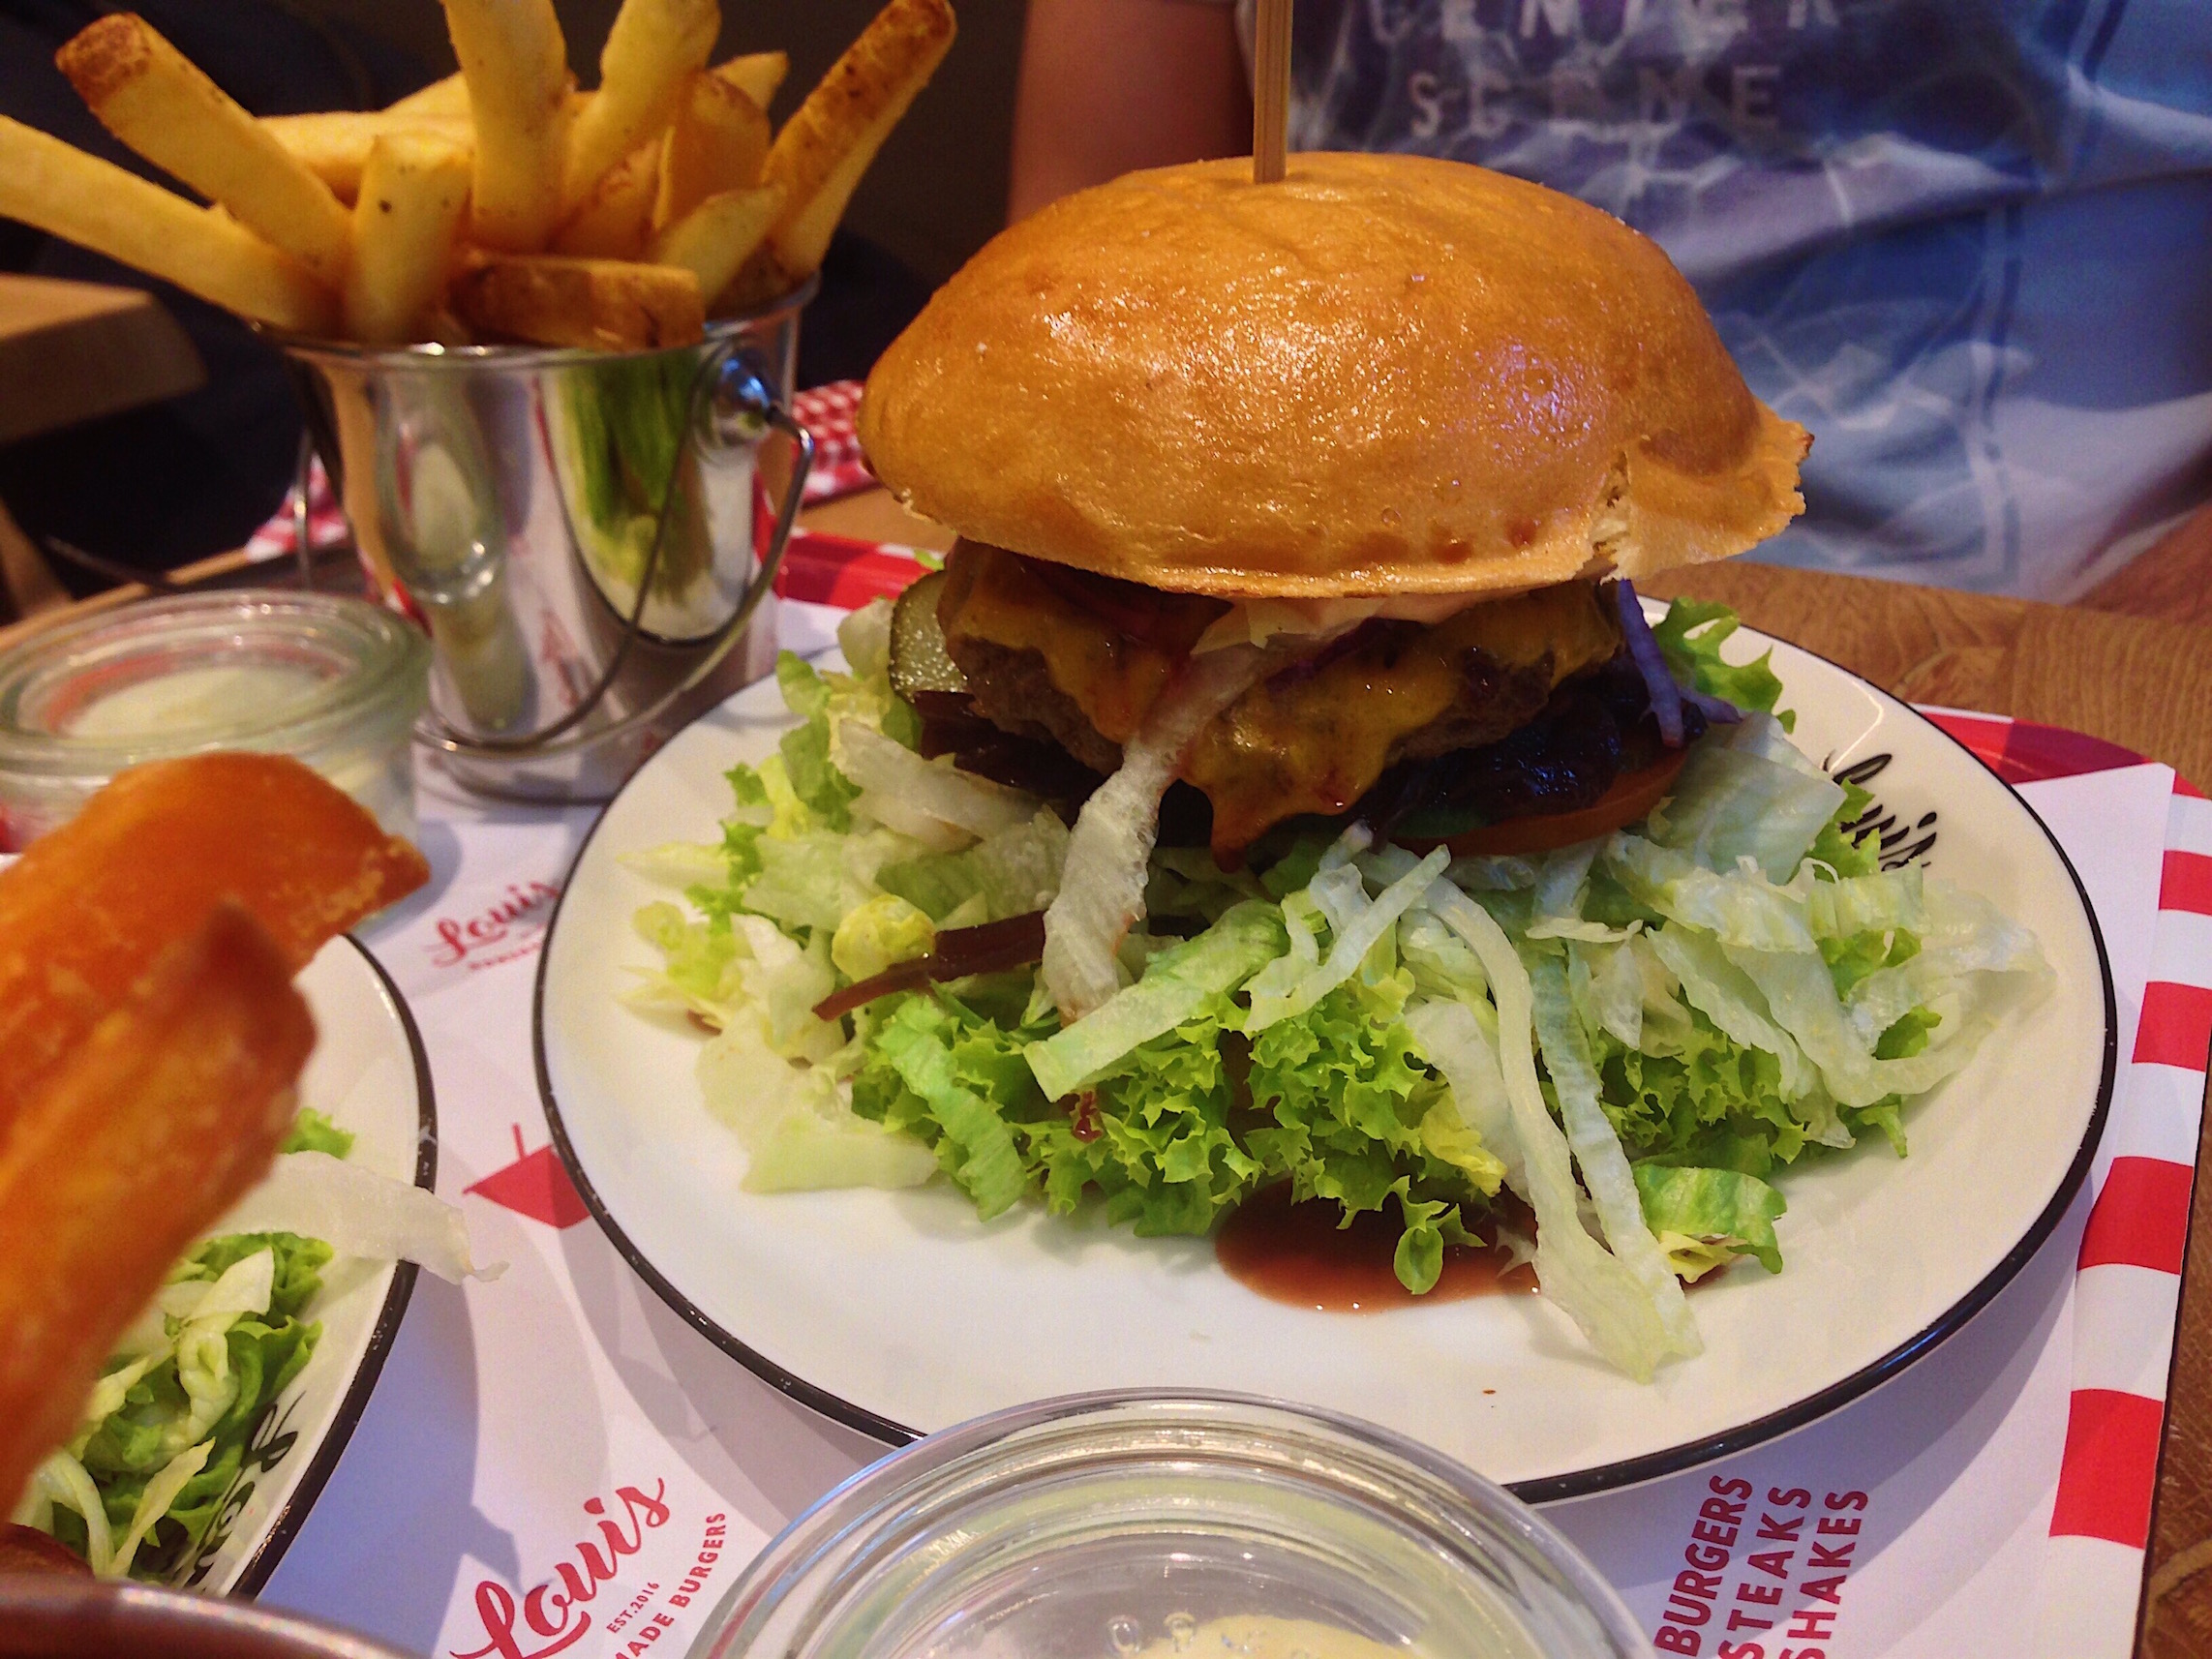 louis burger hannover finest burgers steaks review mimi rose. Black Bedroom Furniture Sets. Home Design Ideas